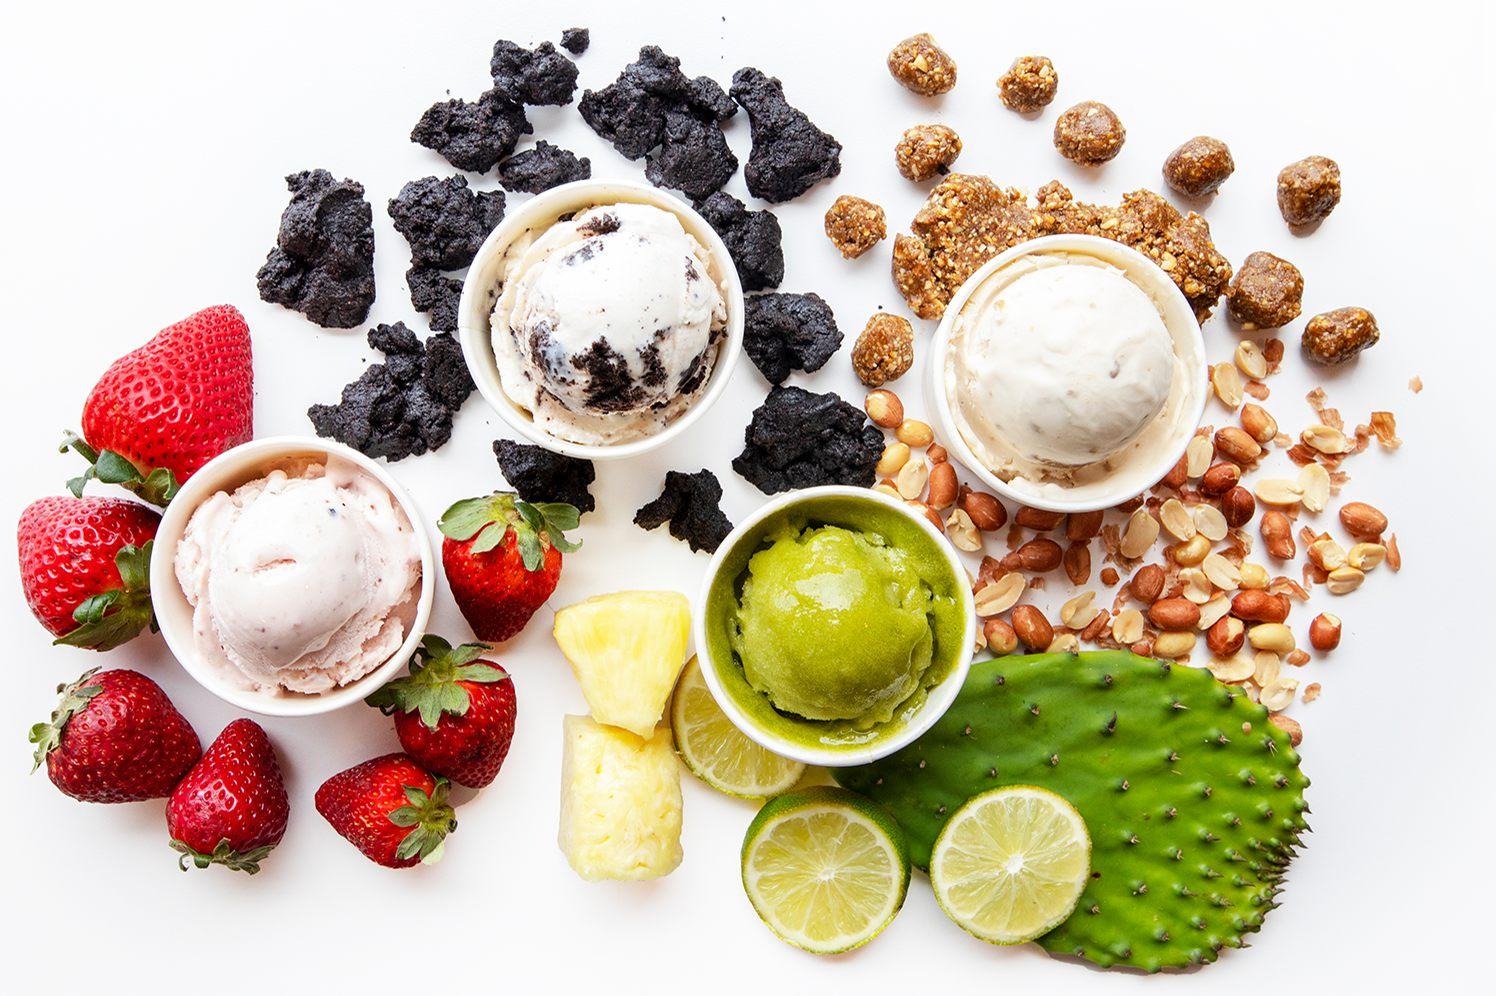 Melt ice creams